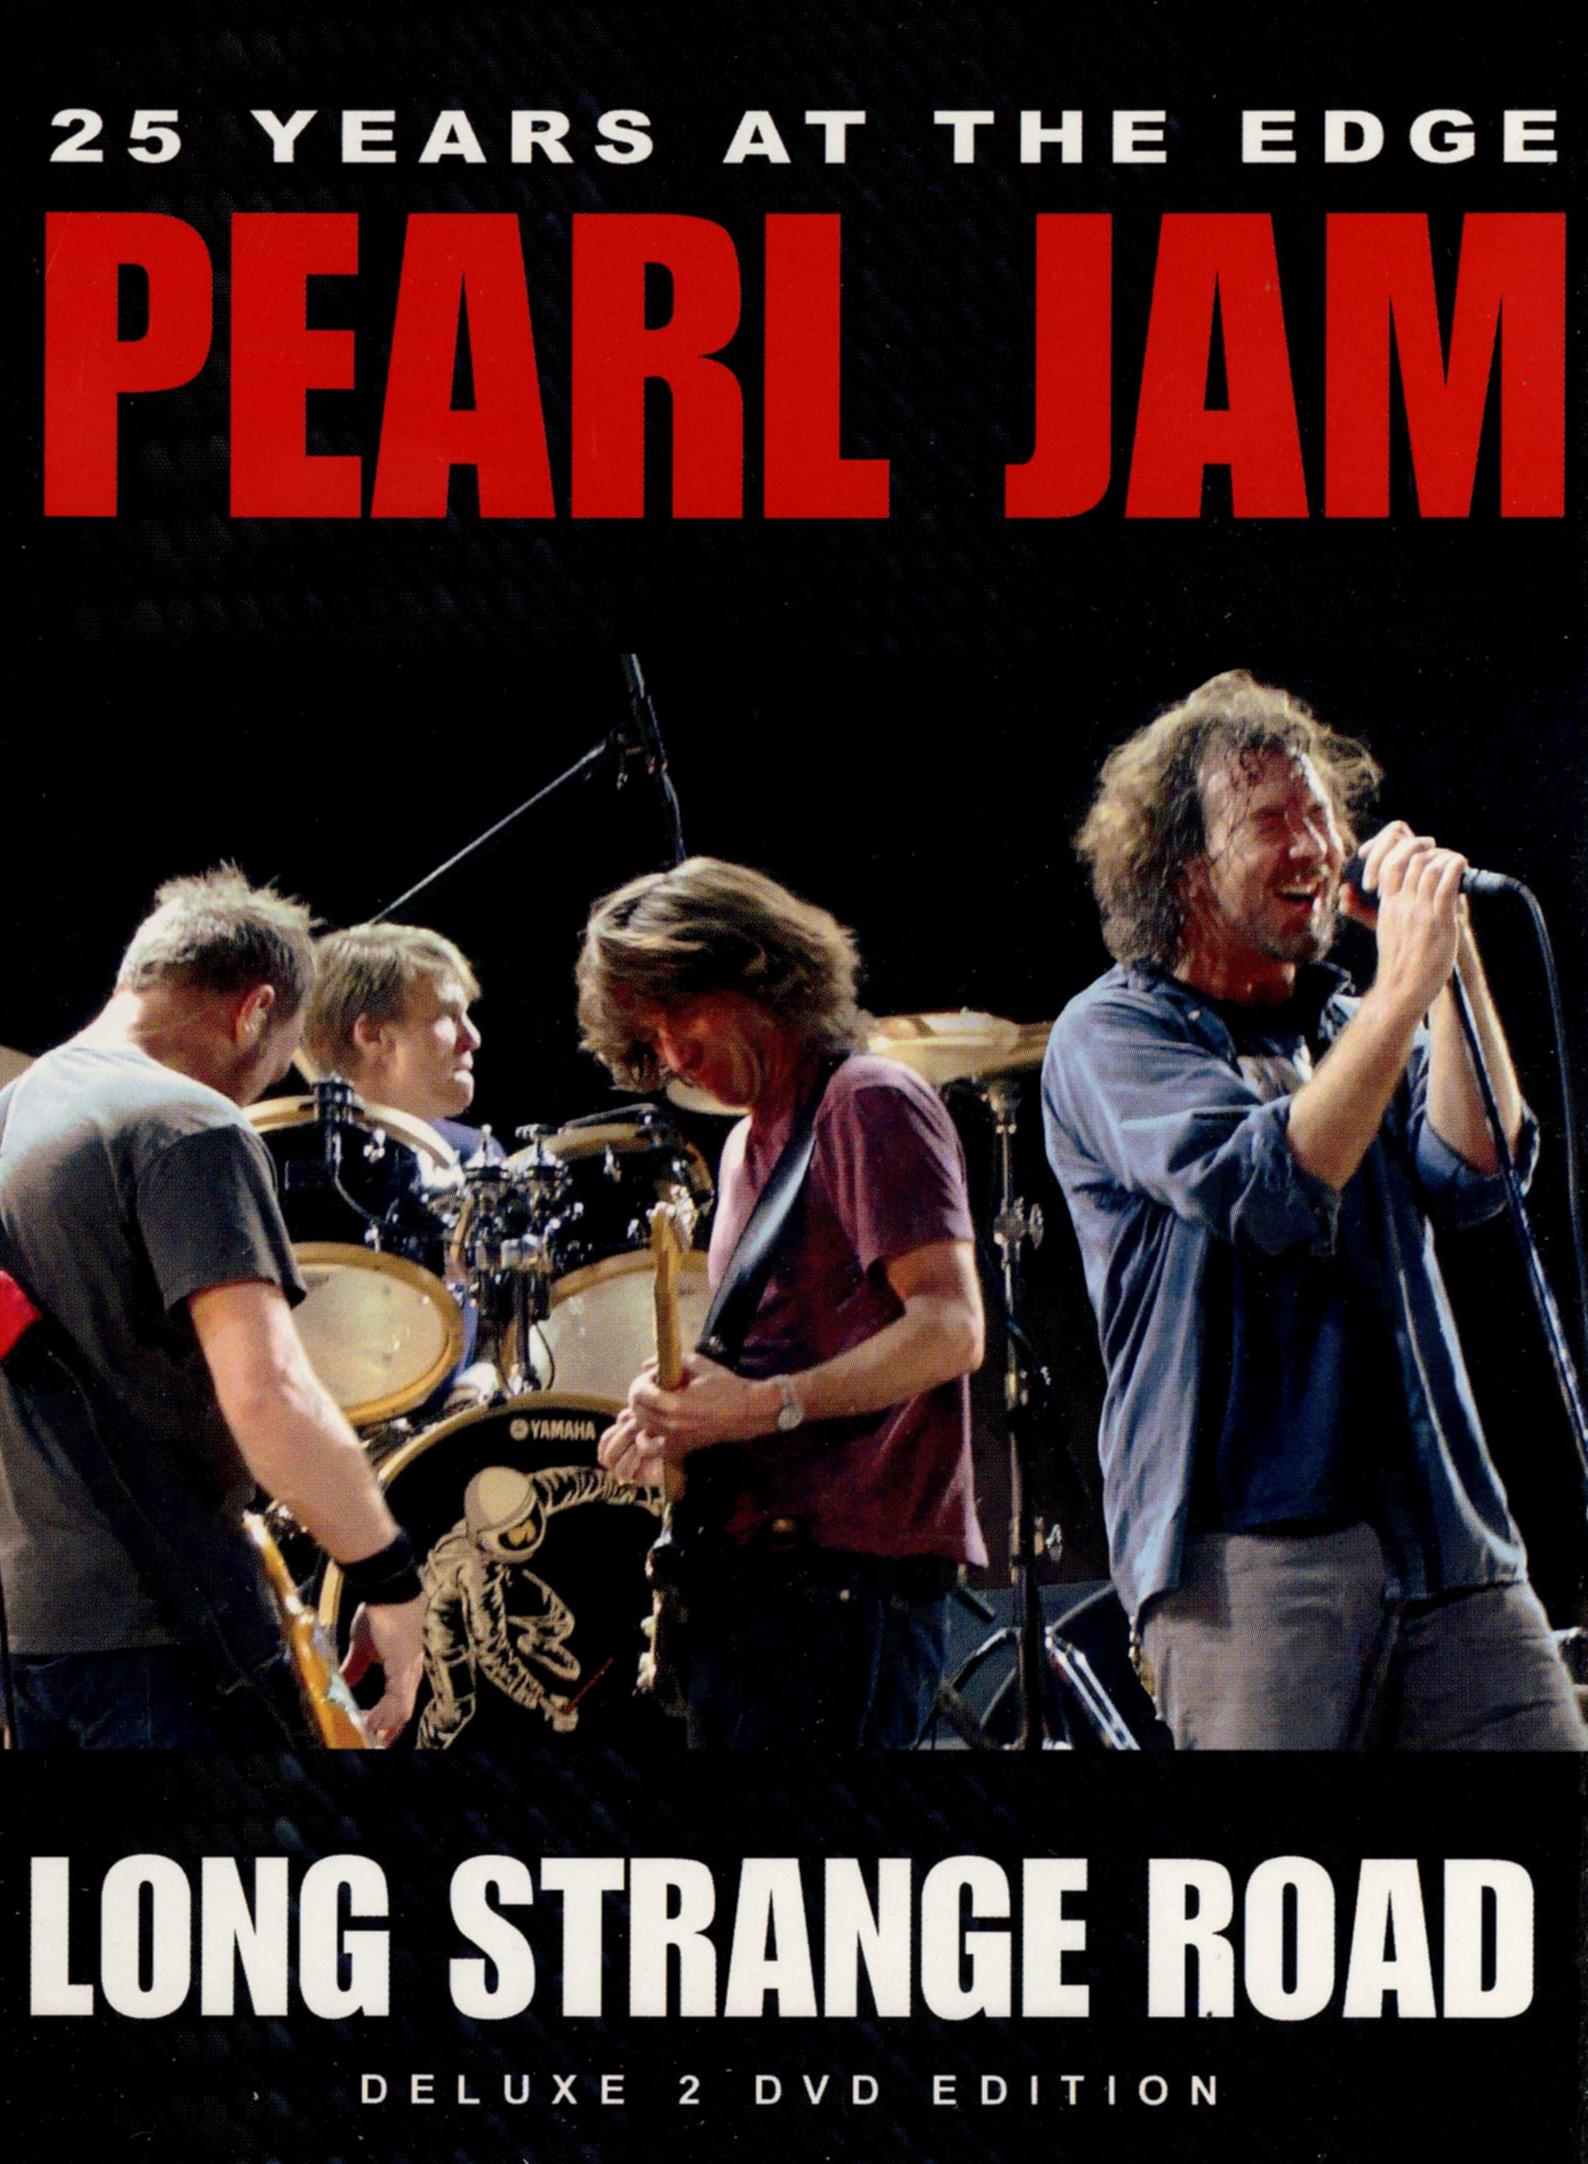 Pearl Jam: Long Strange Road - 25 Years at the Edge